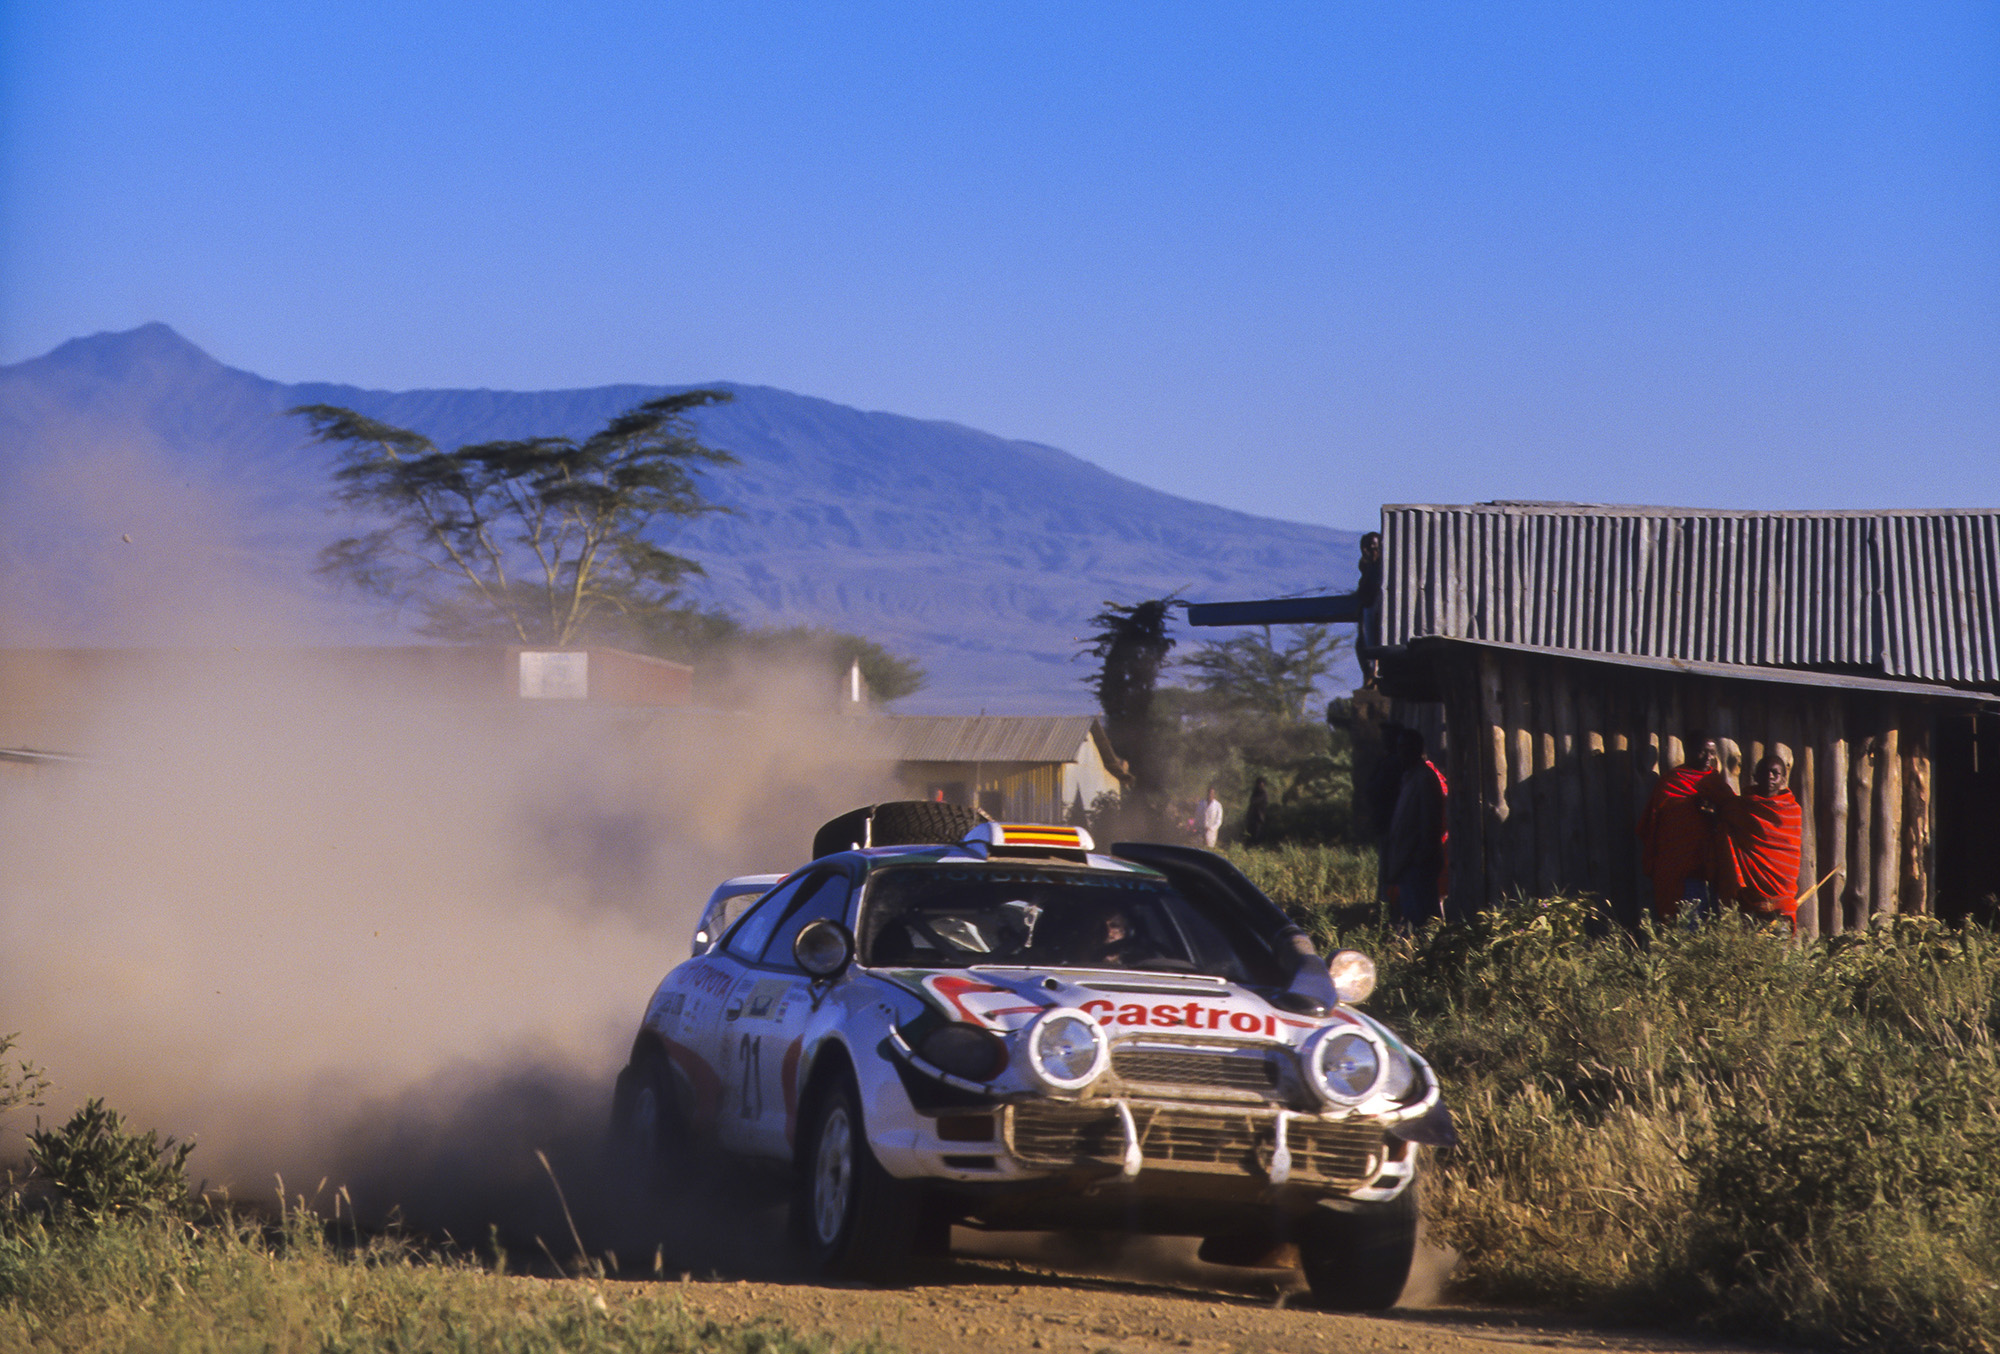 WRC: Safari Rally Kenya [23-27 Junio] - Página 2 E4eY4H7WEAIj-pA?format=jpg&name=large